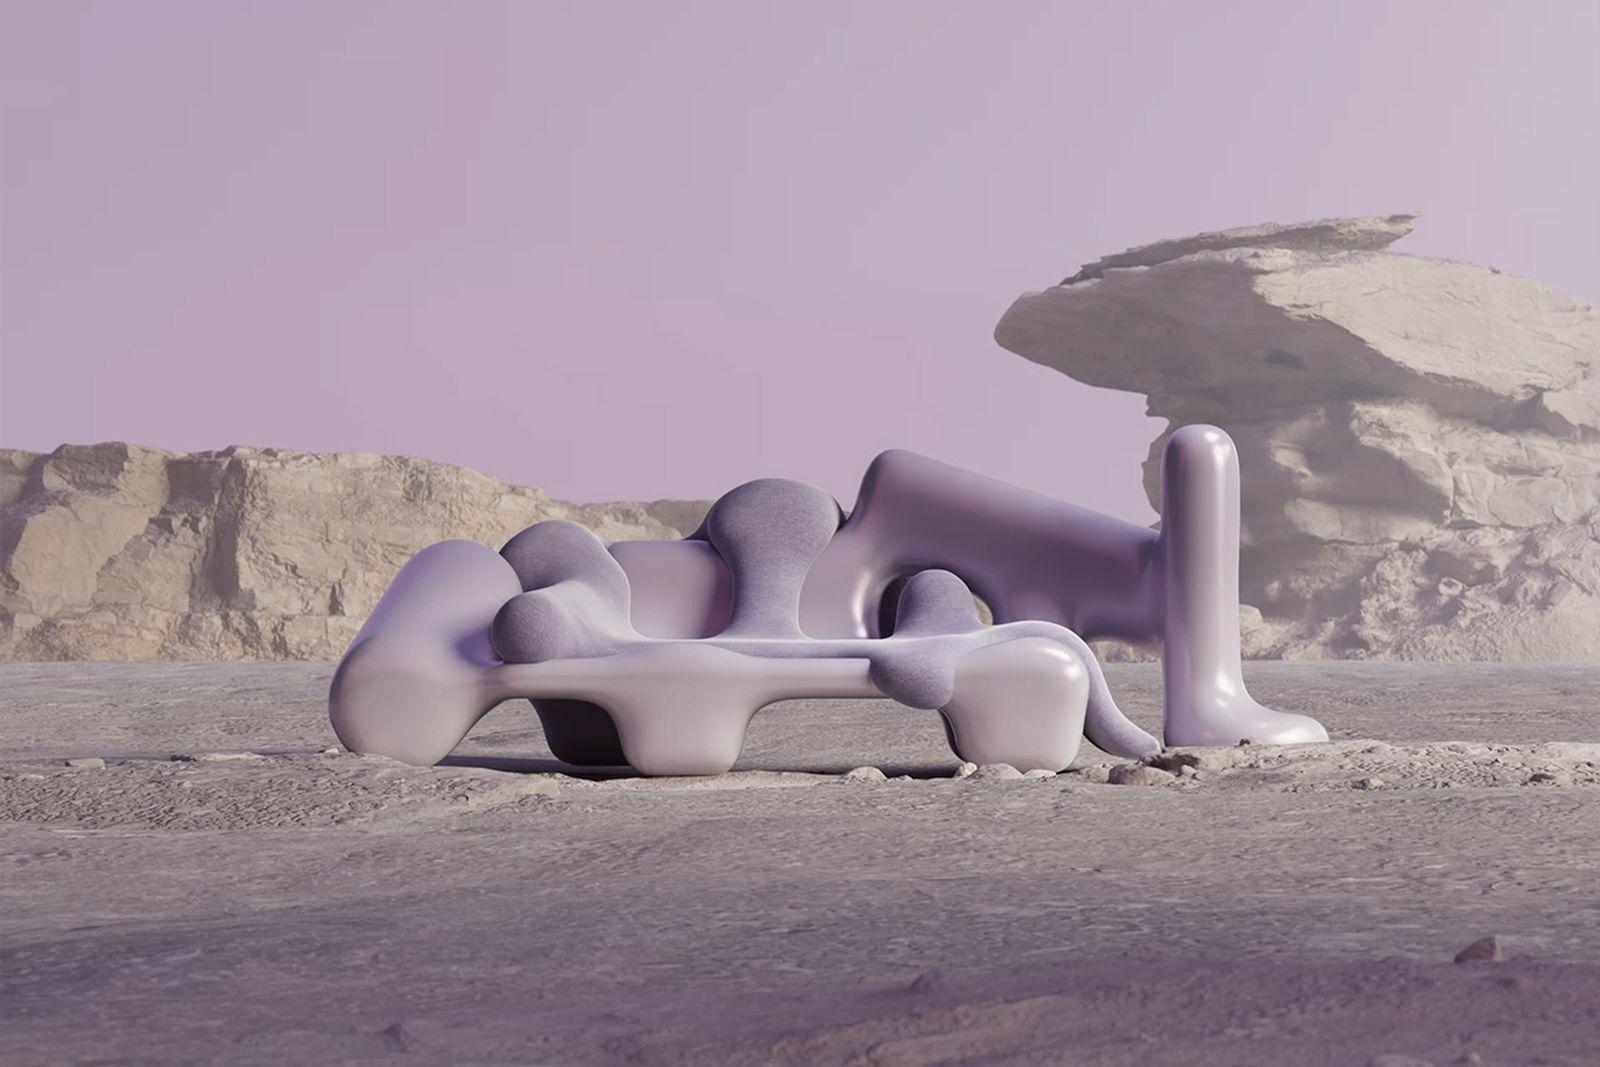 andres-reisinger-the-shipping-digital-furniture-auction-05